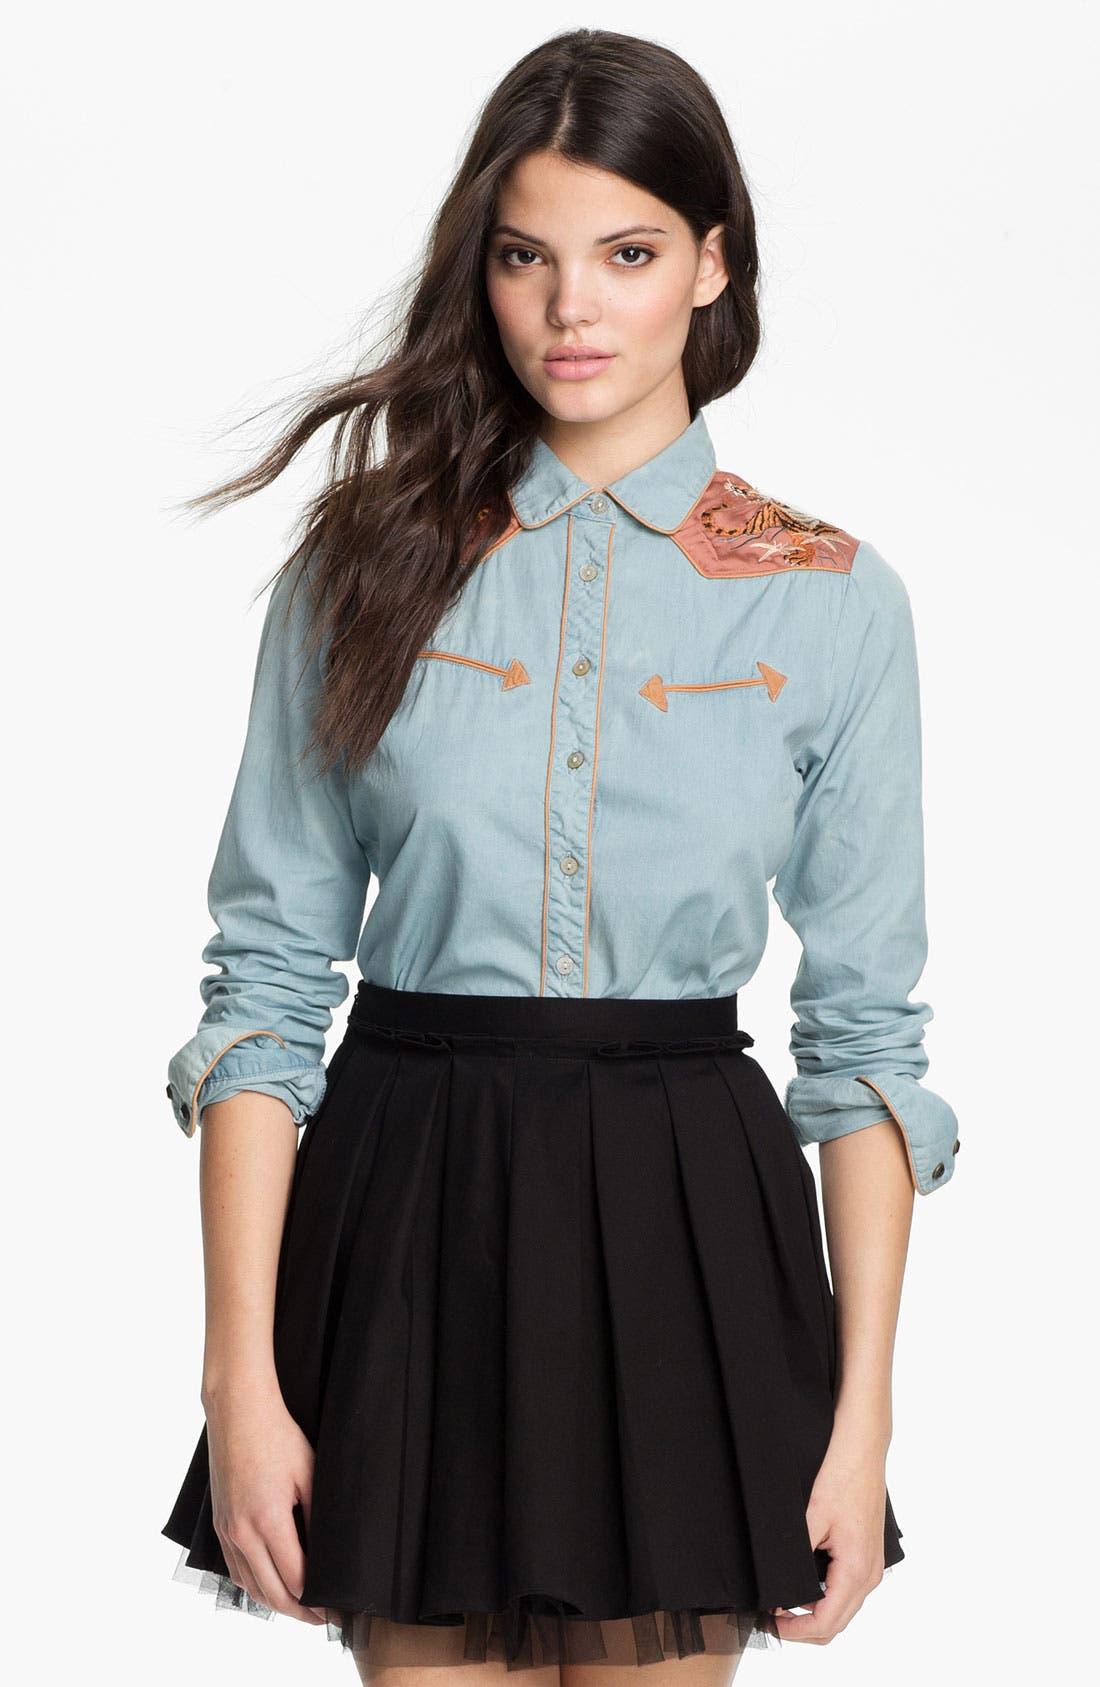 Alternate Image 1 Selected - Maison Scotch Embroidered Chambray Shirt